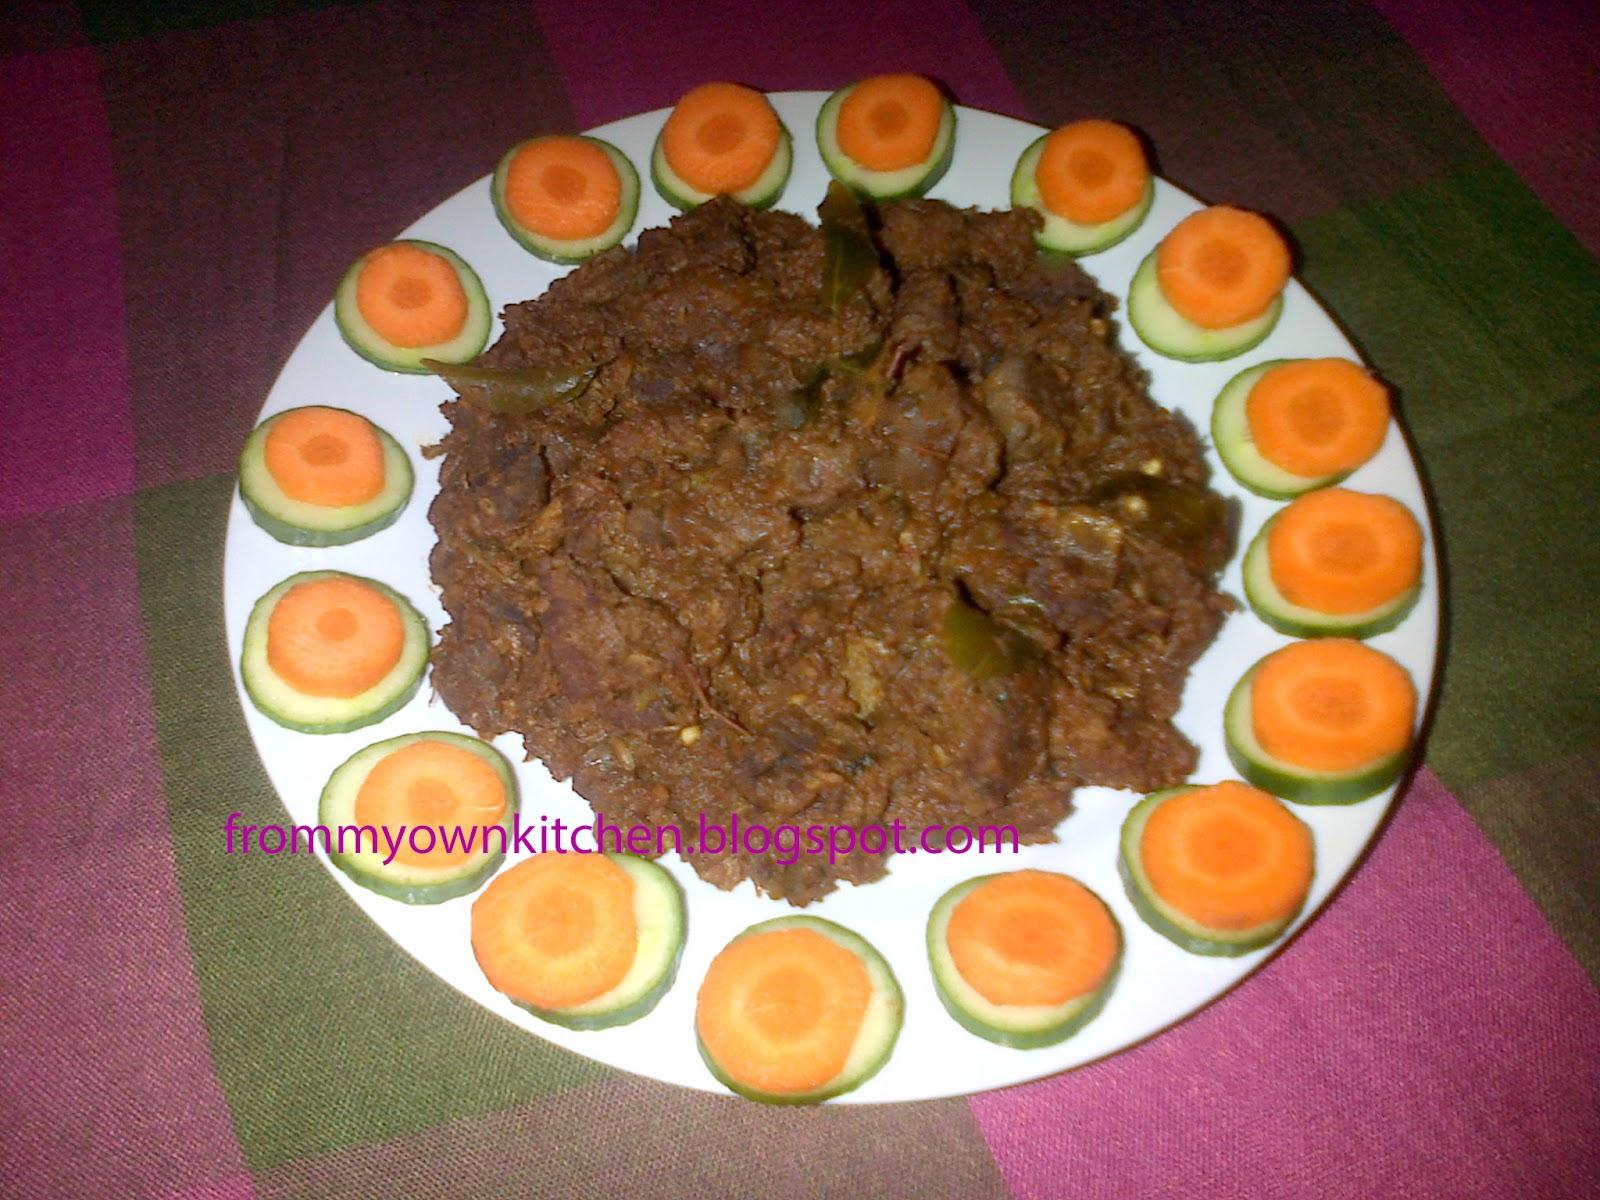 From My Own Kitchen: Beef Varattiyathu/Beef Roast